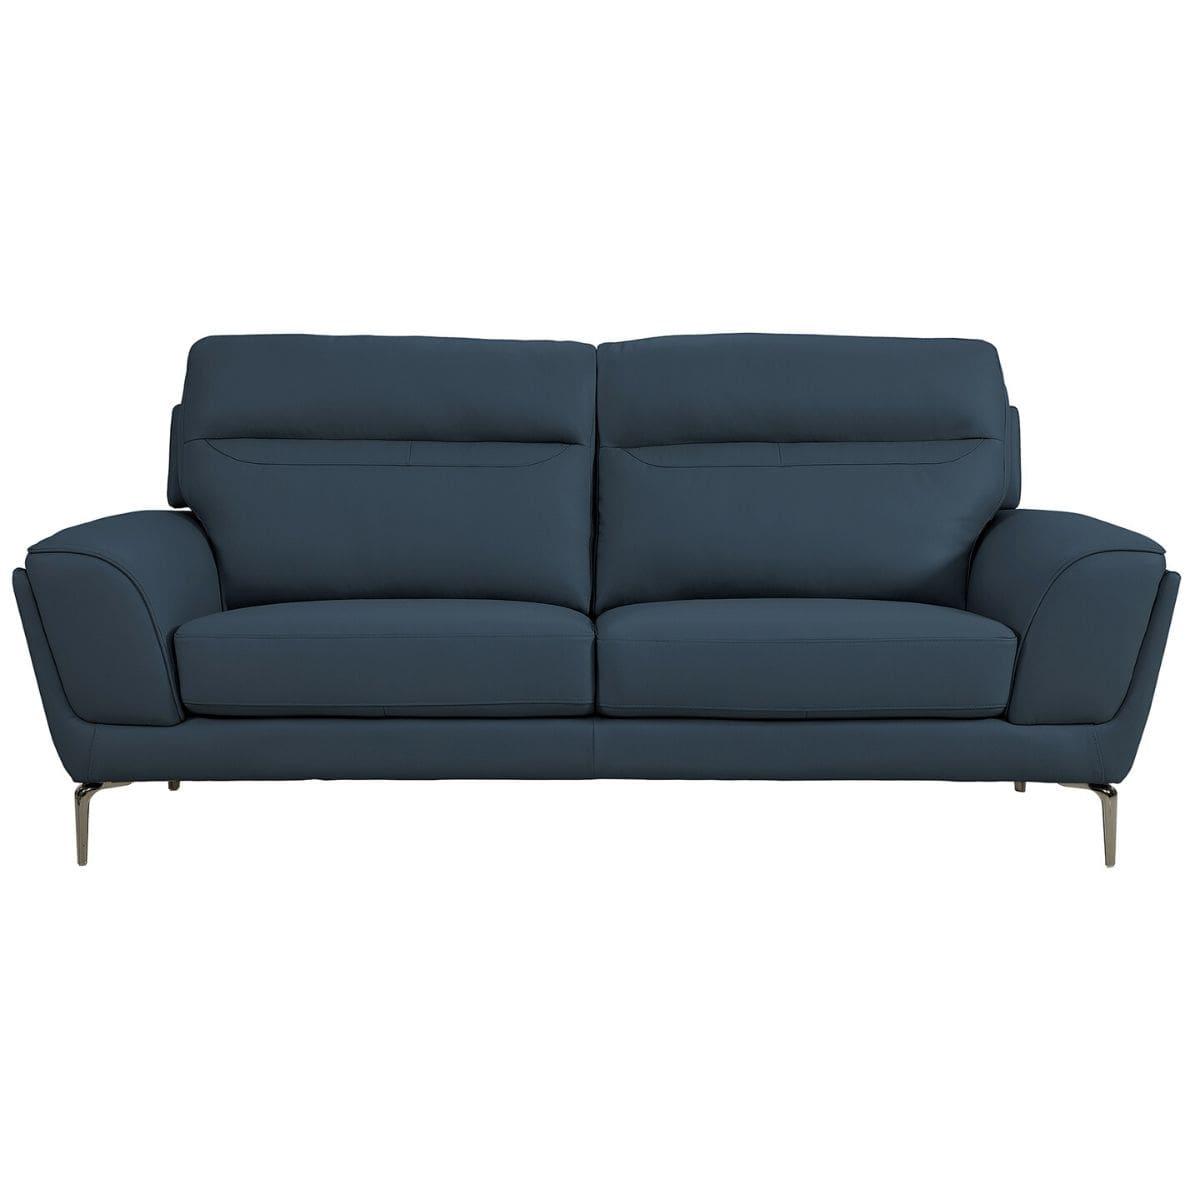 Velisse Leather 3 Seater Sofa